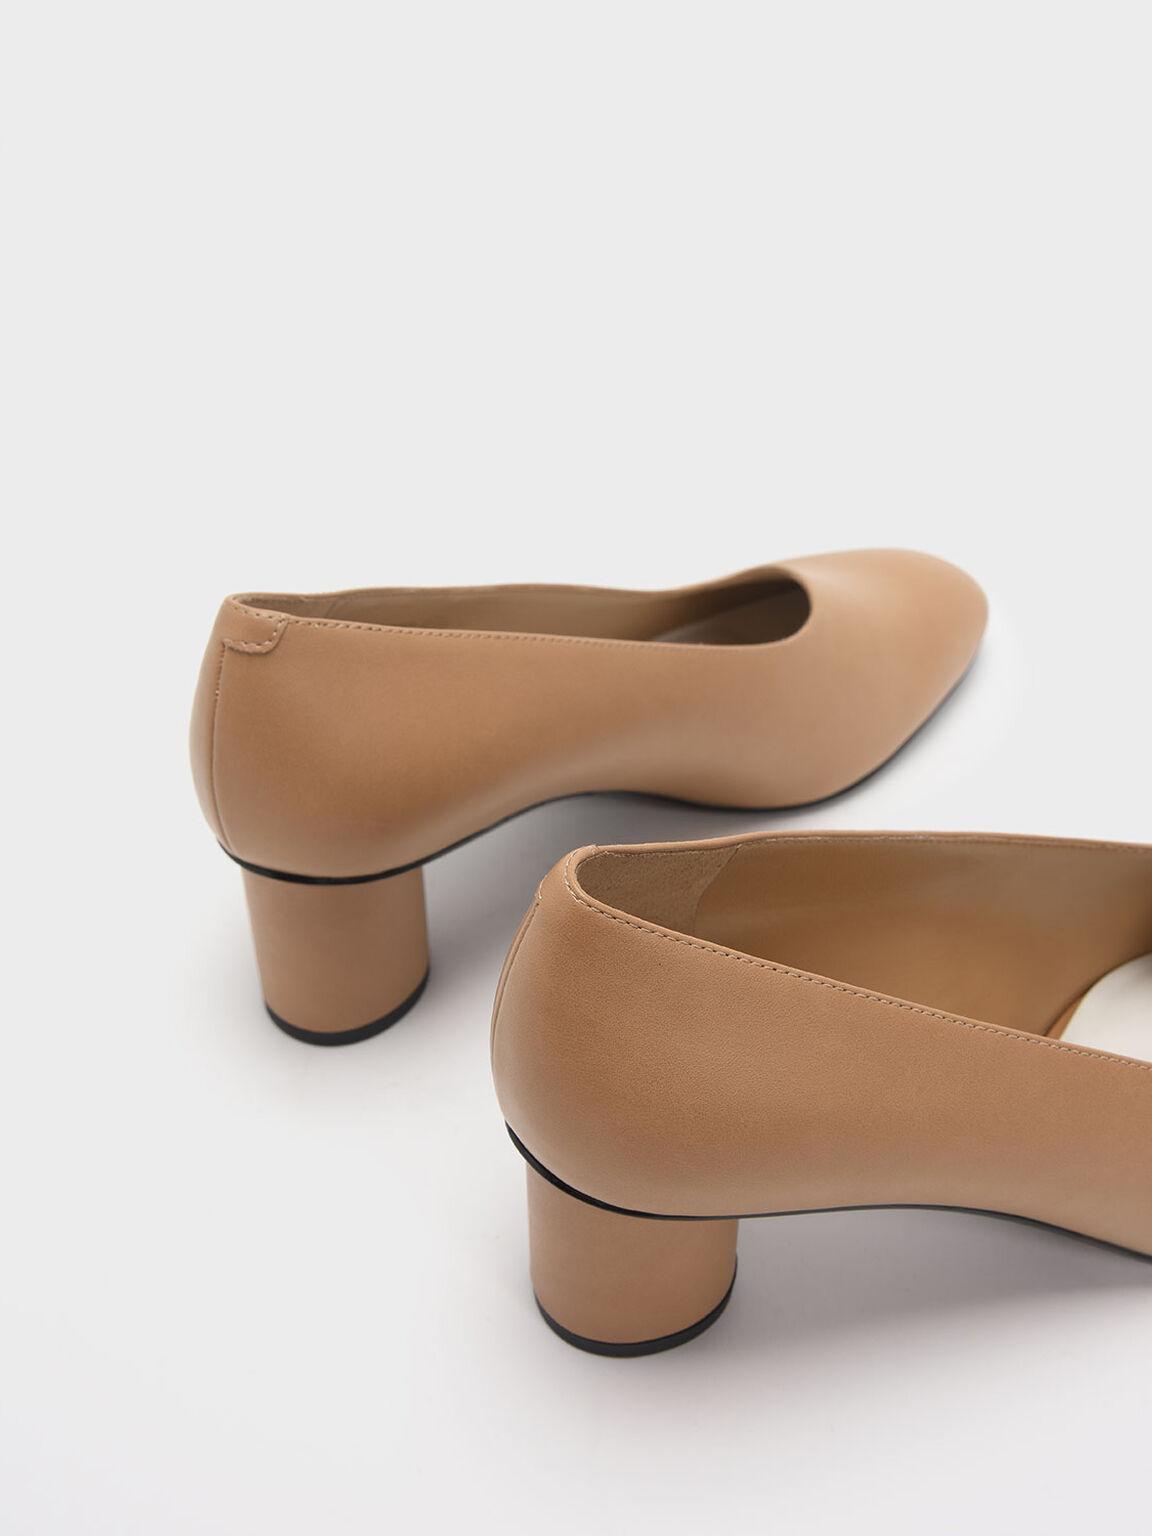 Asymmetric-Cut Cylindrical Heel Pumps, Sand, hi-res